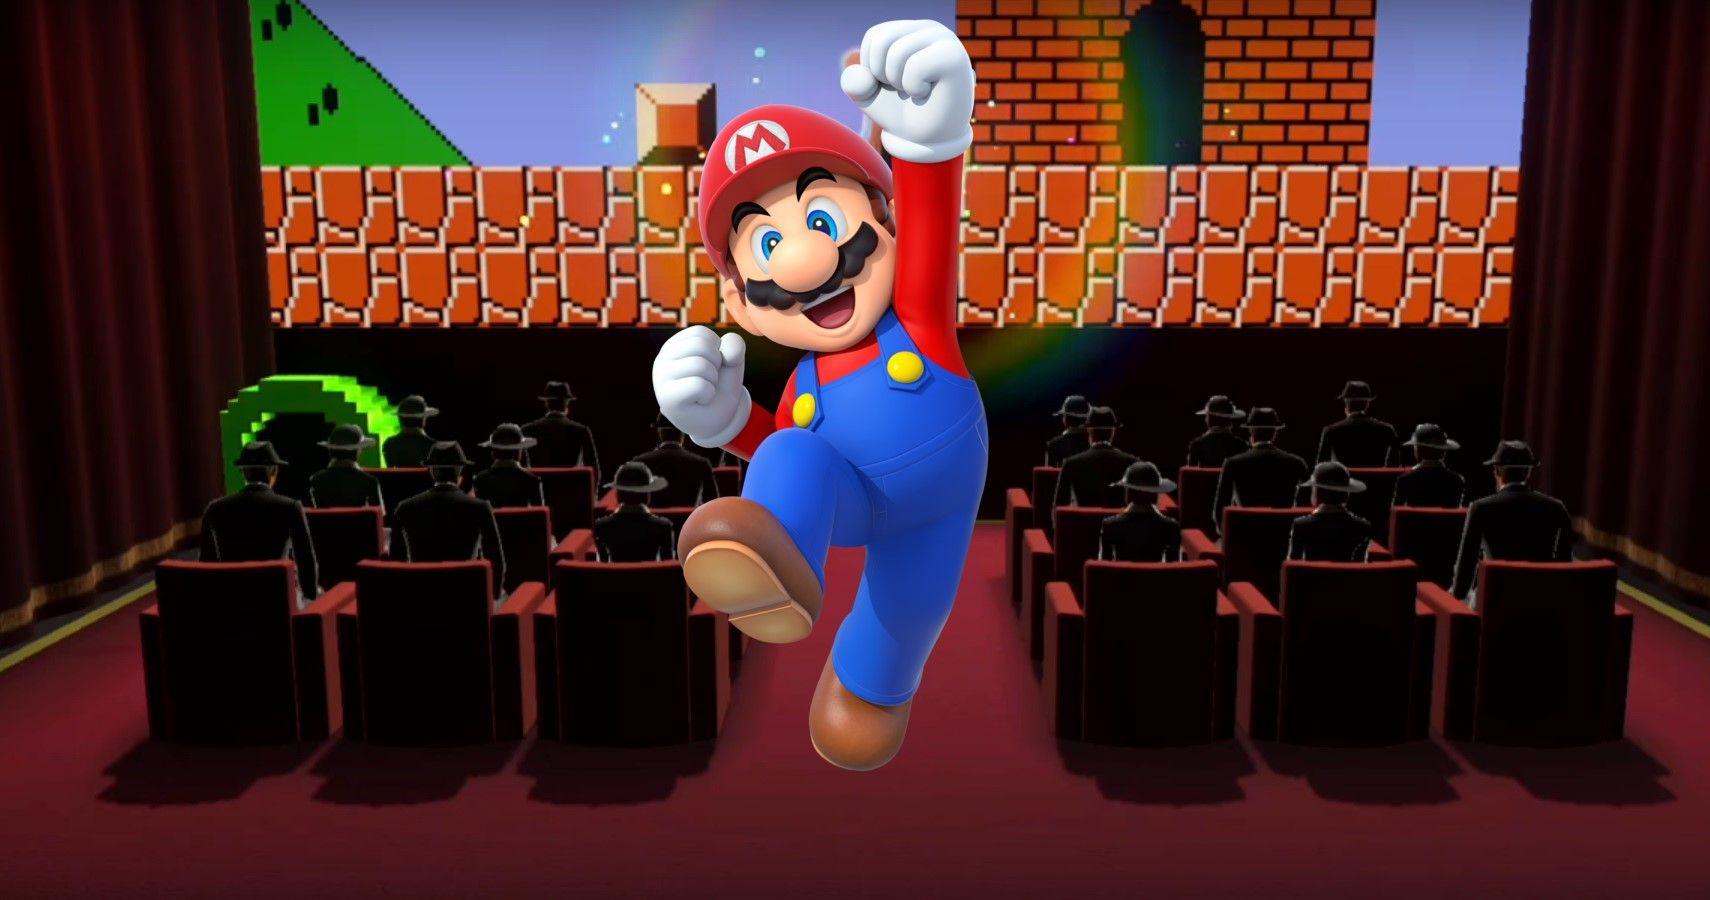 Shigeru Miyamoto Changed His Mind About Making Mario Movies